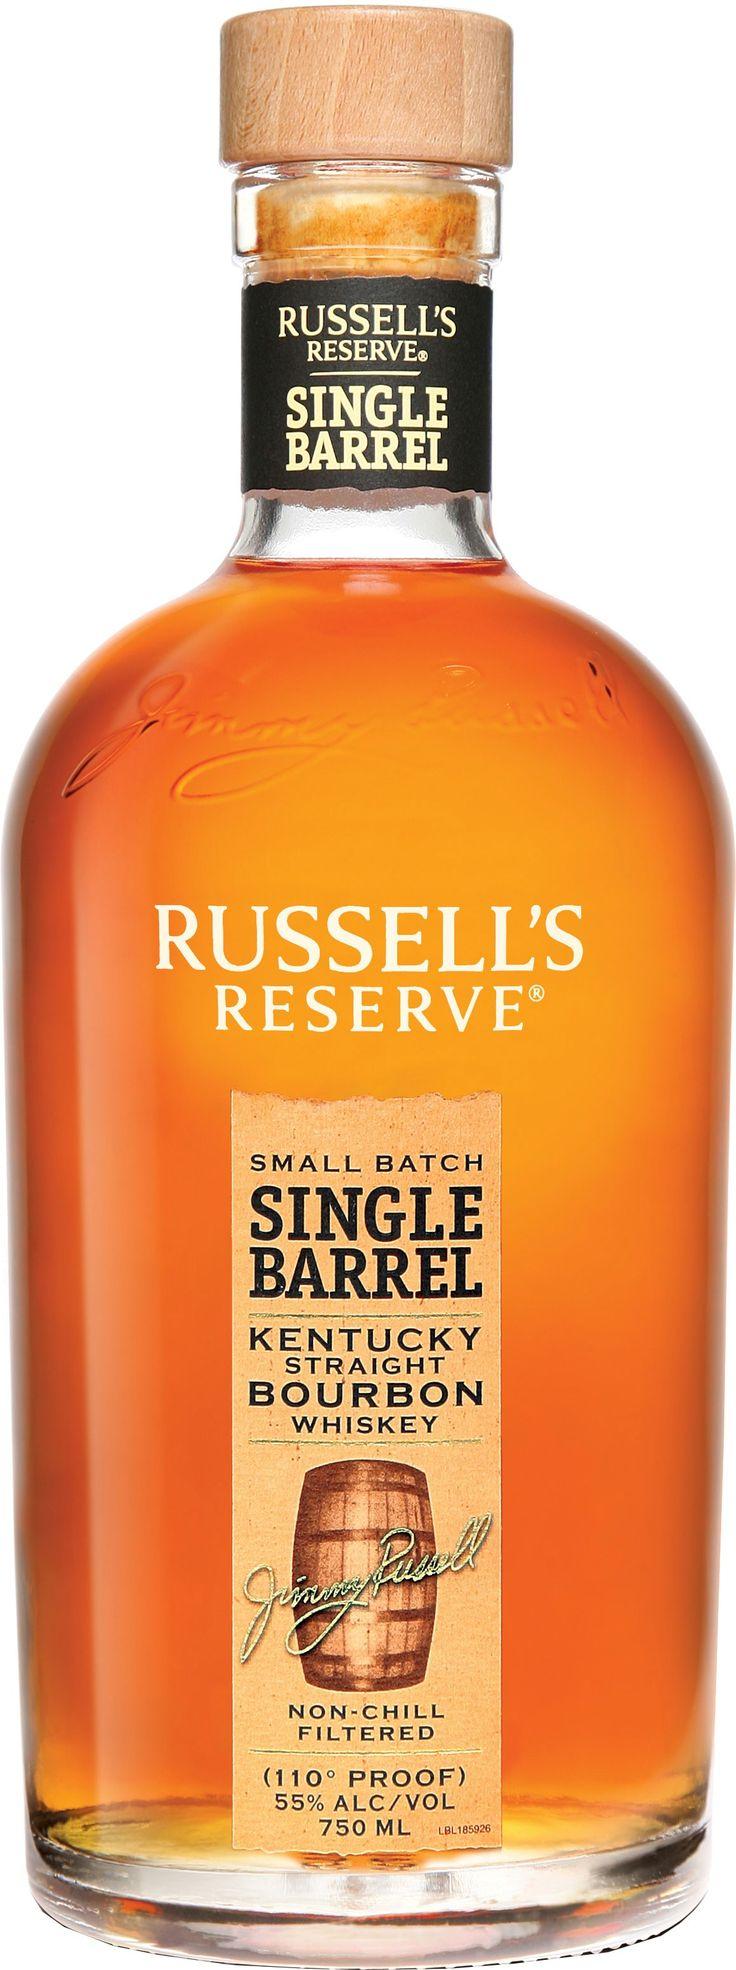 Russell's Reserve Small Batch Single Barrel Bourbon | @Caskers